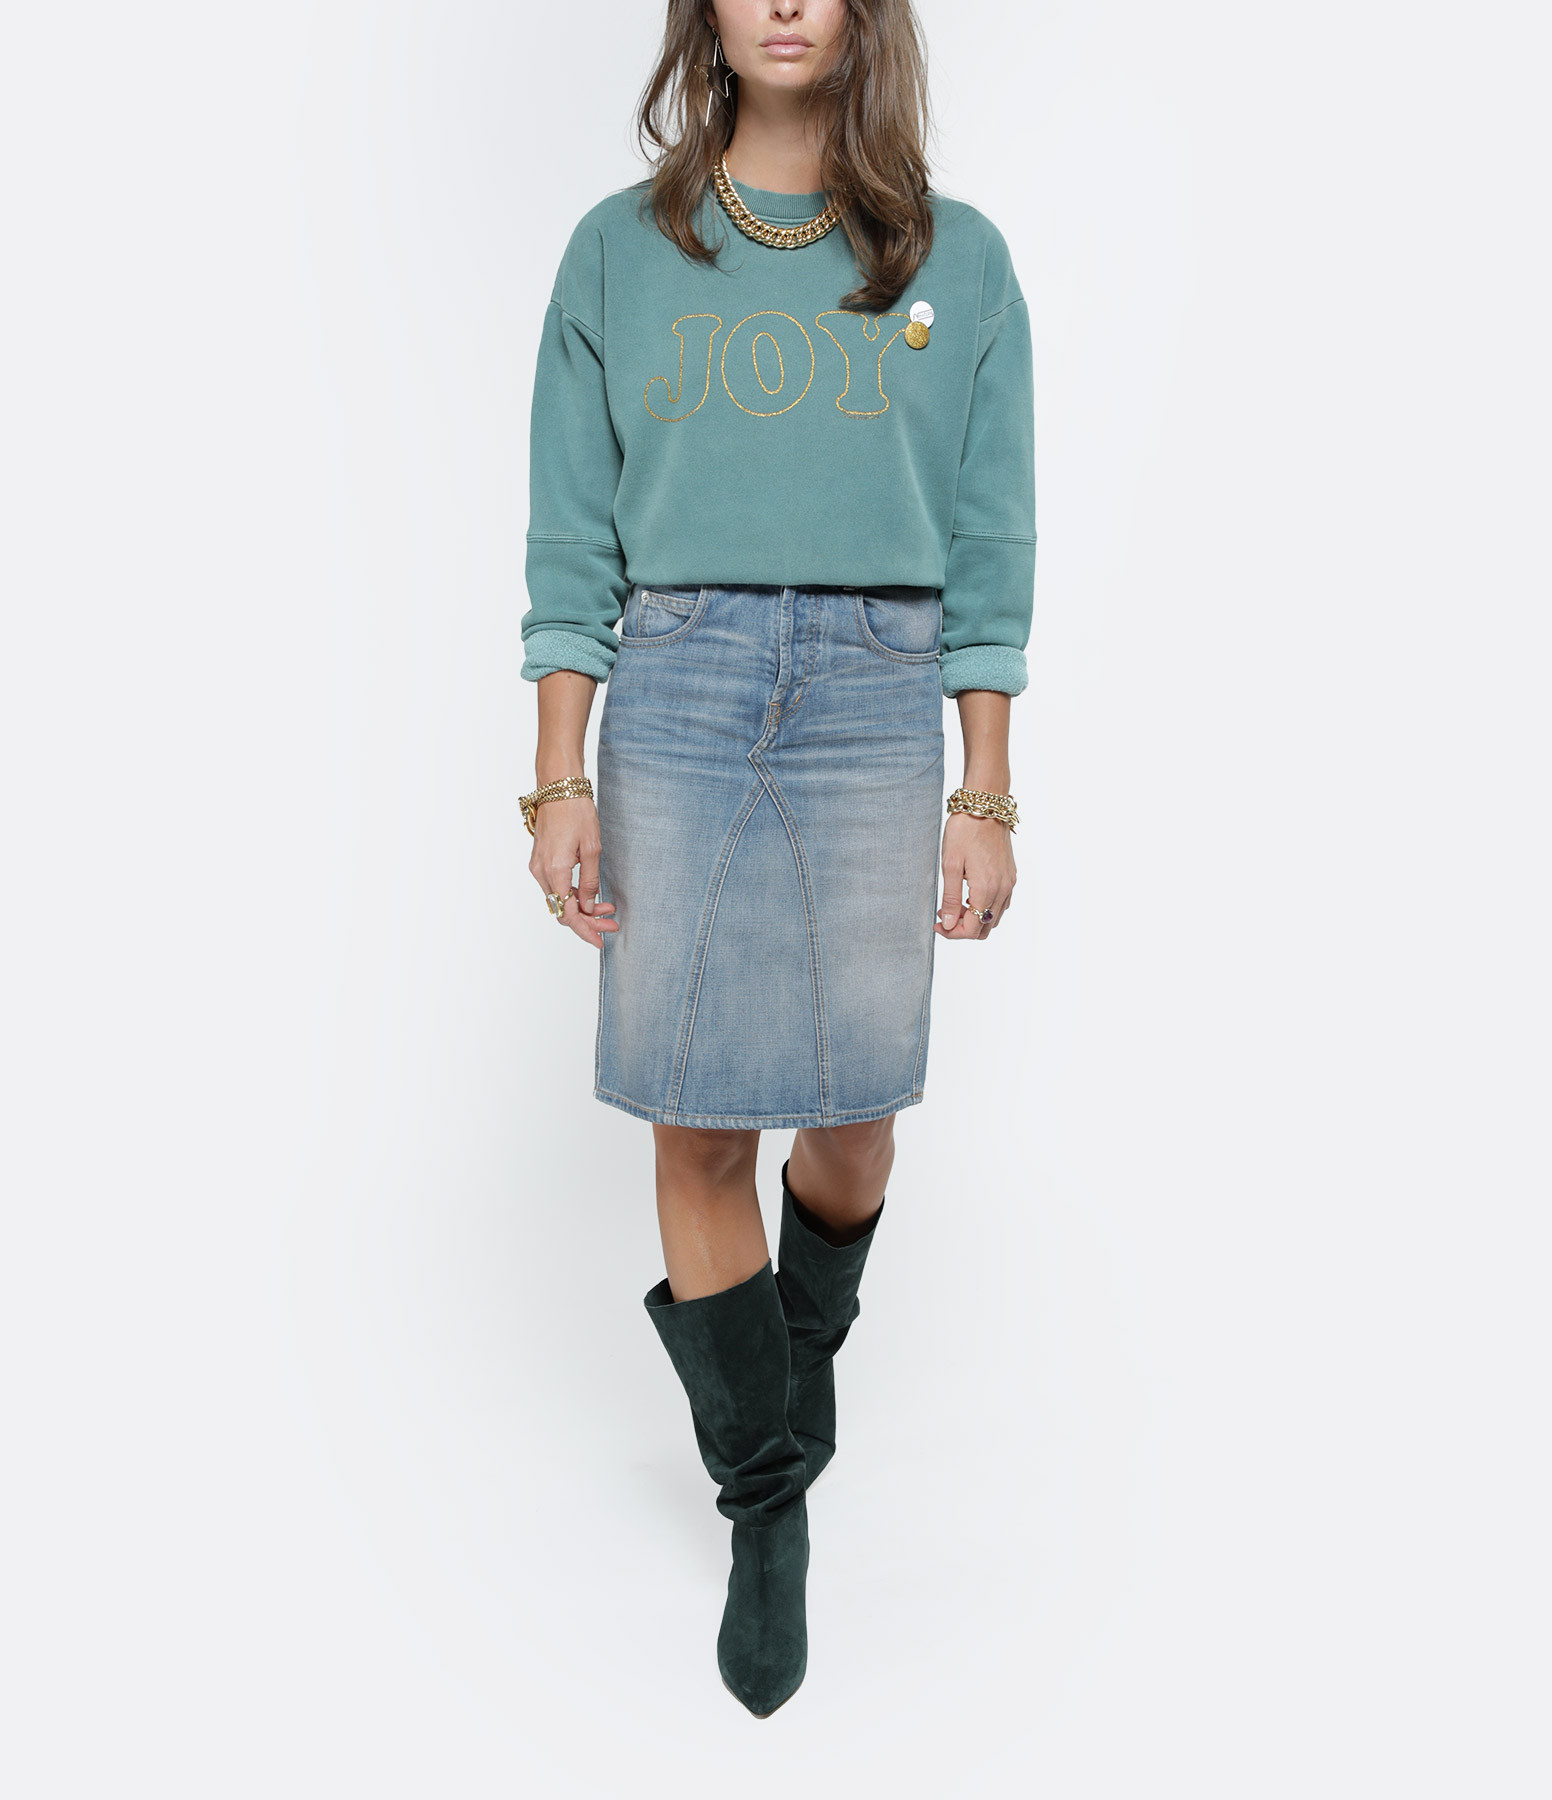 NEWTONE - Sweatshirt Joy Coton Forêt